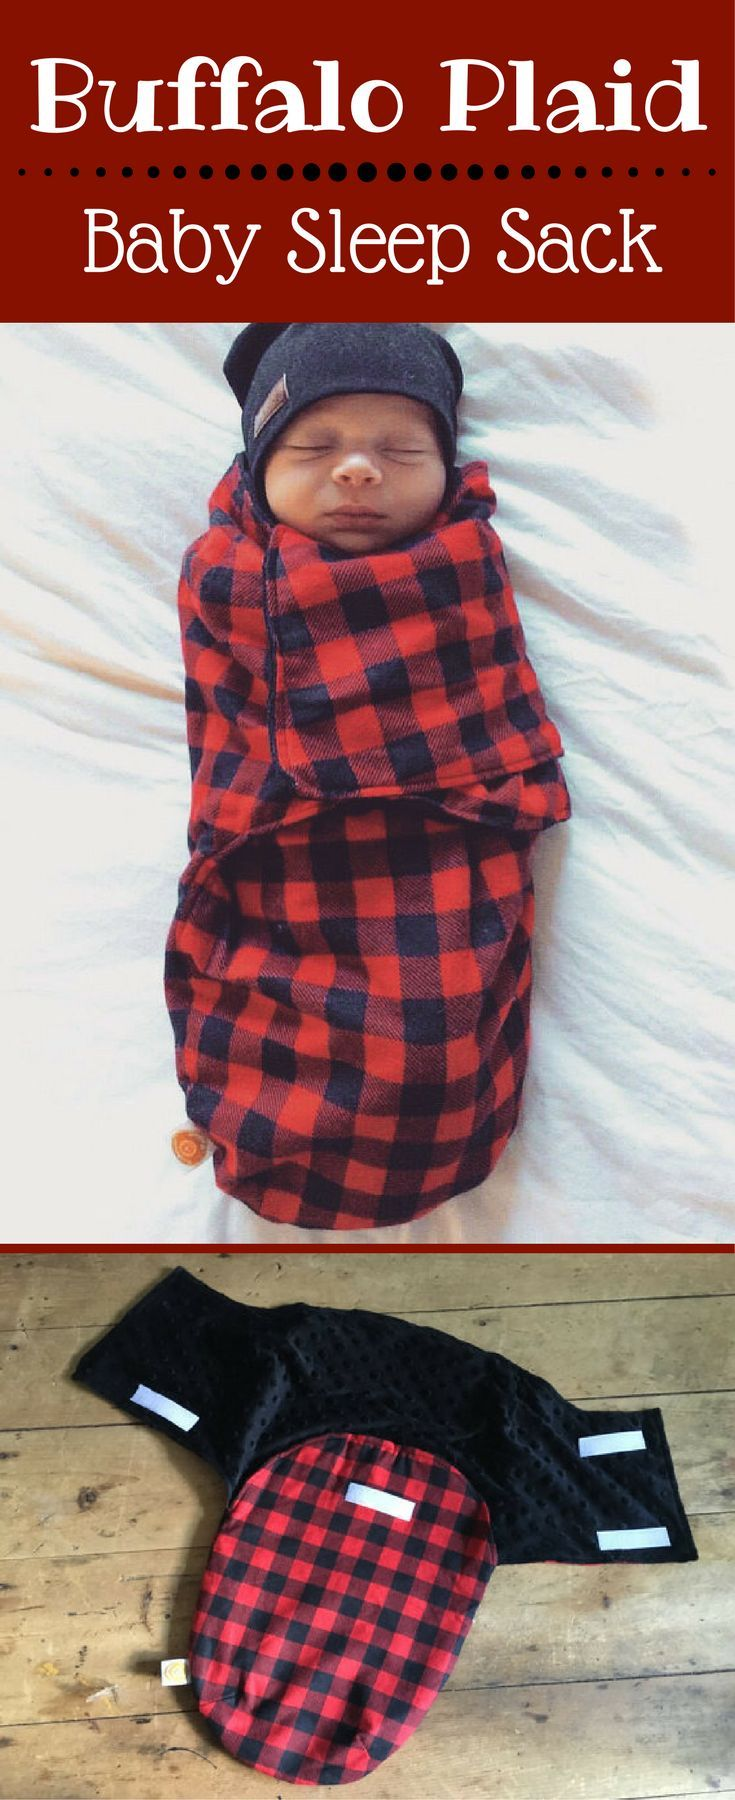 This sleep sack is so, so cute! Buffalo plaid baby sleep sack lined with minky material. Buffalo Plaid   Buffalo Check   Lumberjack Plaid   Baby Swaddle   Baby Shower Gift Ideas #buffalocheck #ad #buffaloplaideverything #babyswaddle